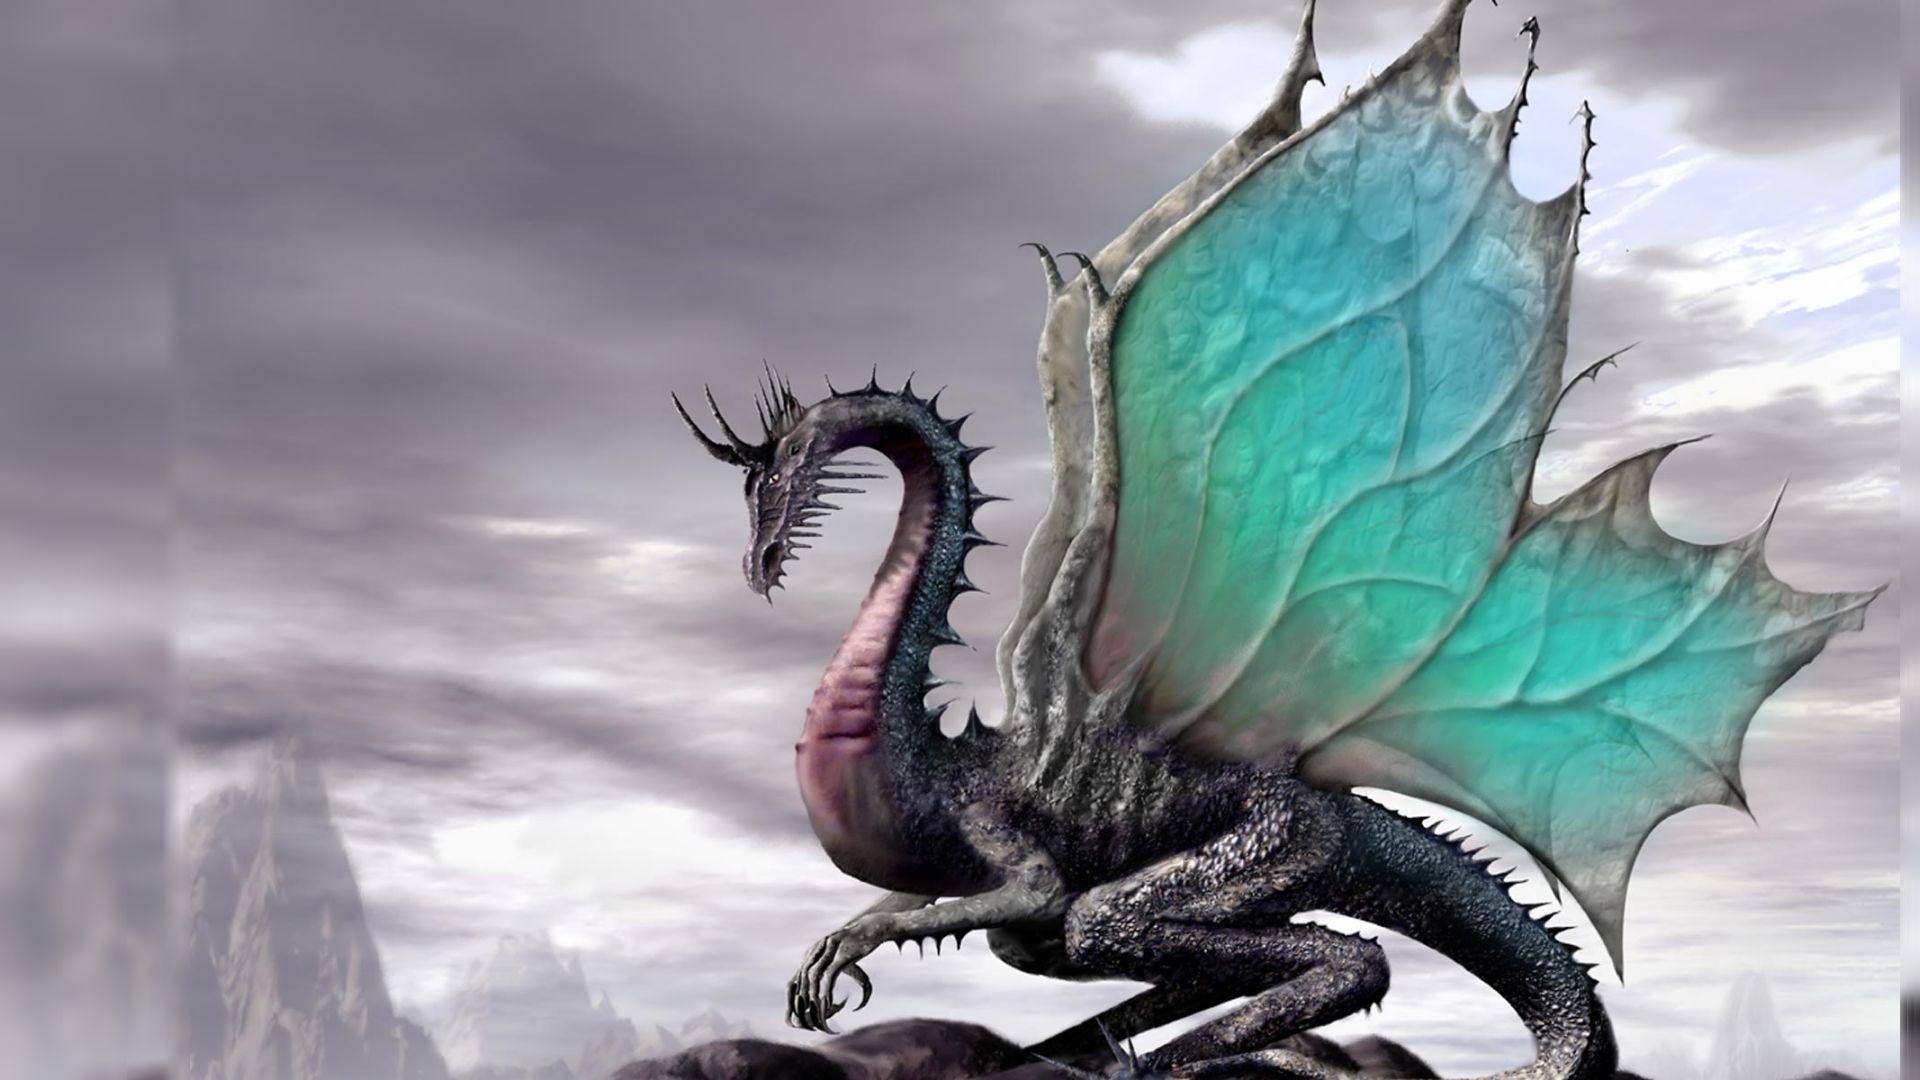 dragon wallpaper widescreen high resolution - photo #2